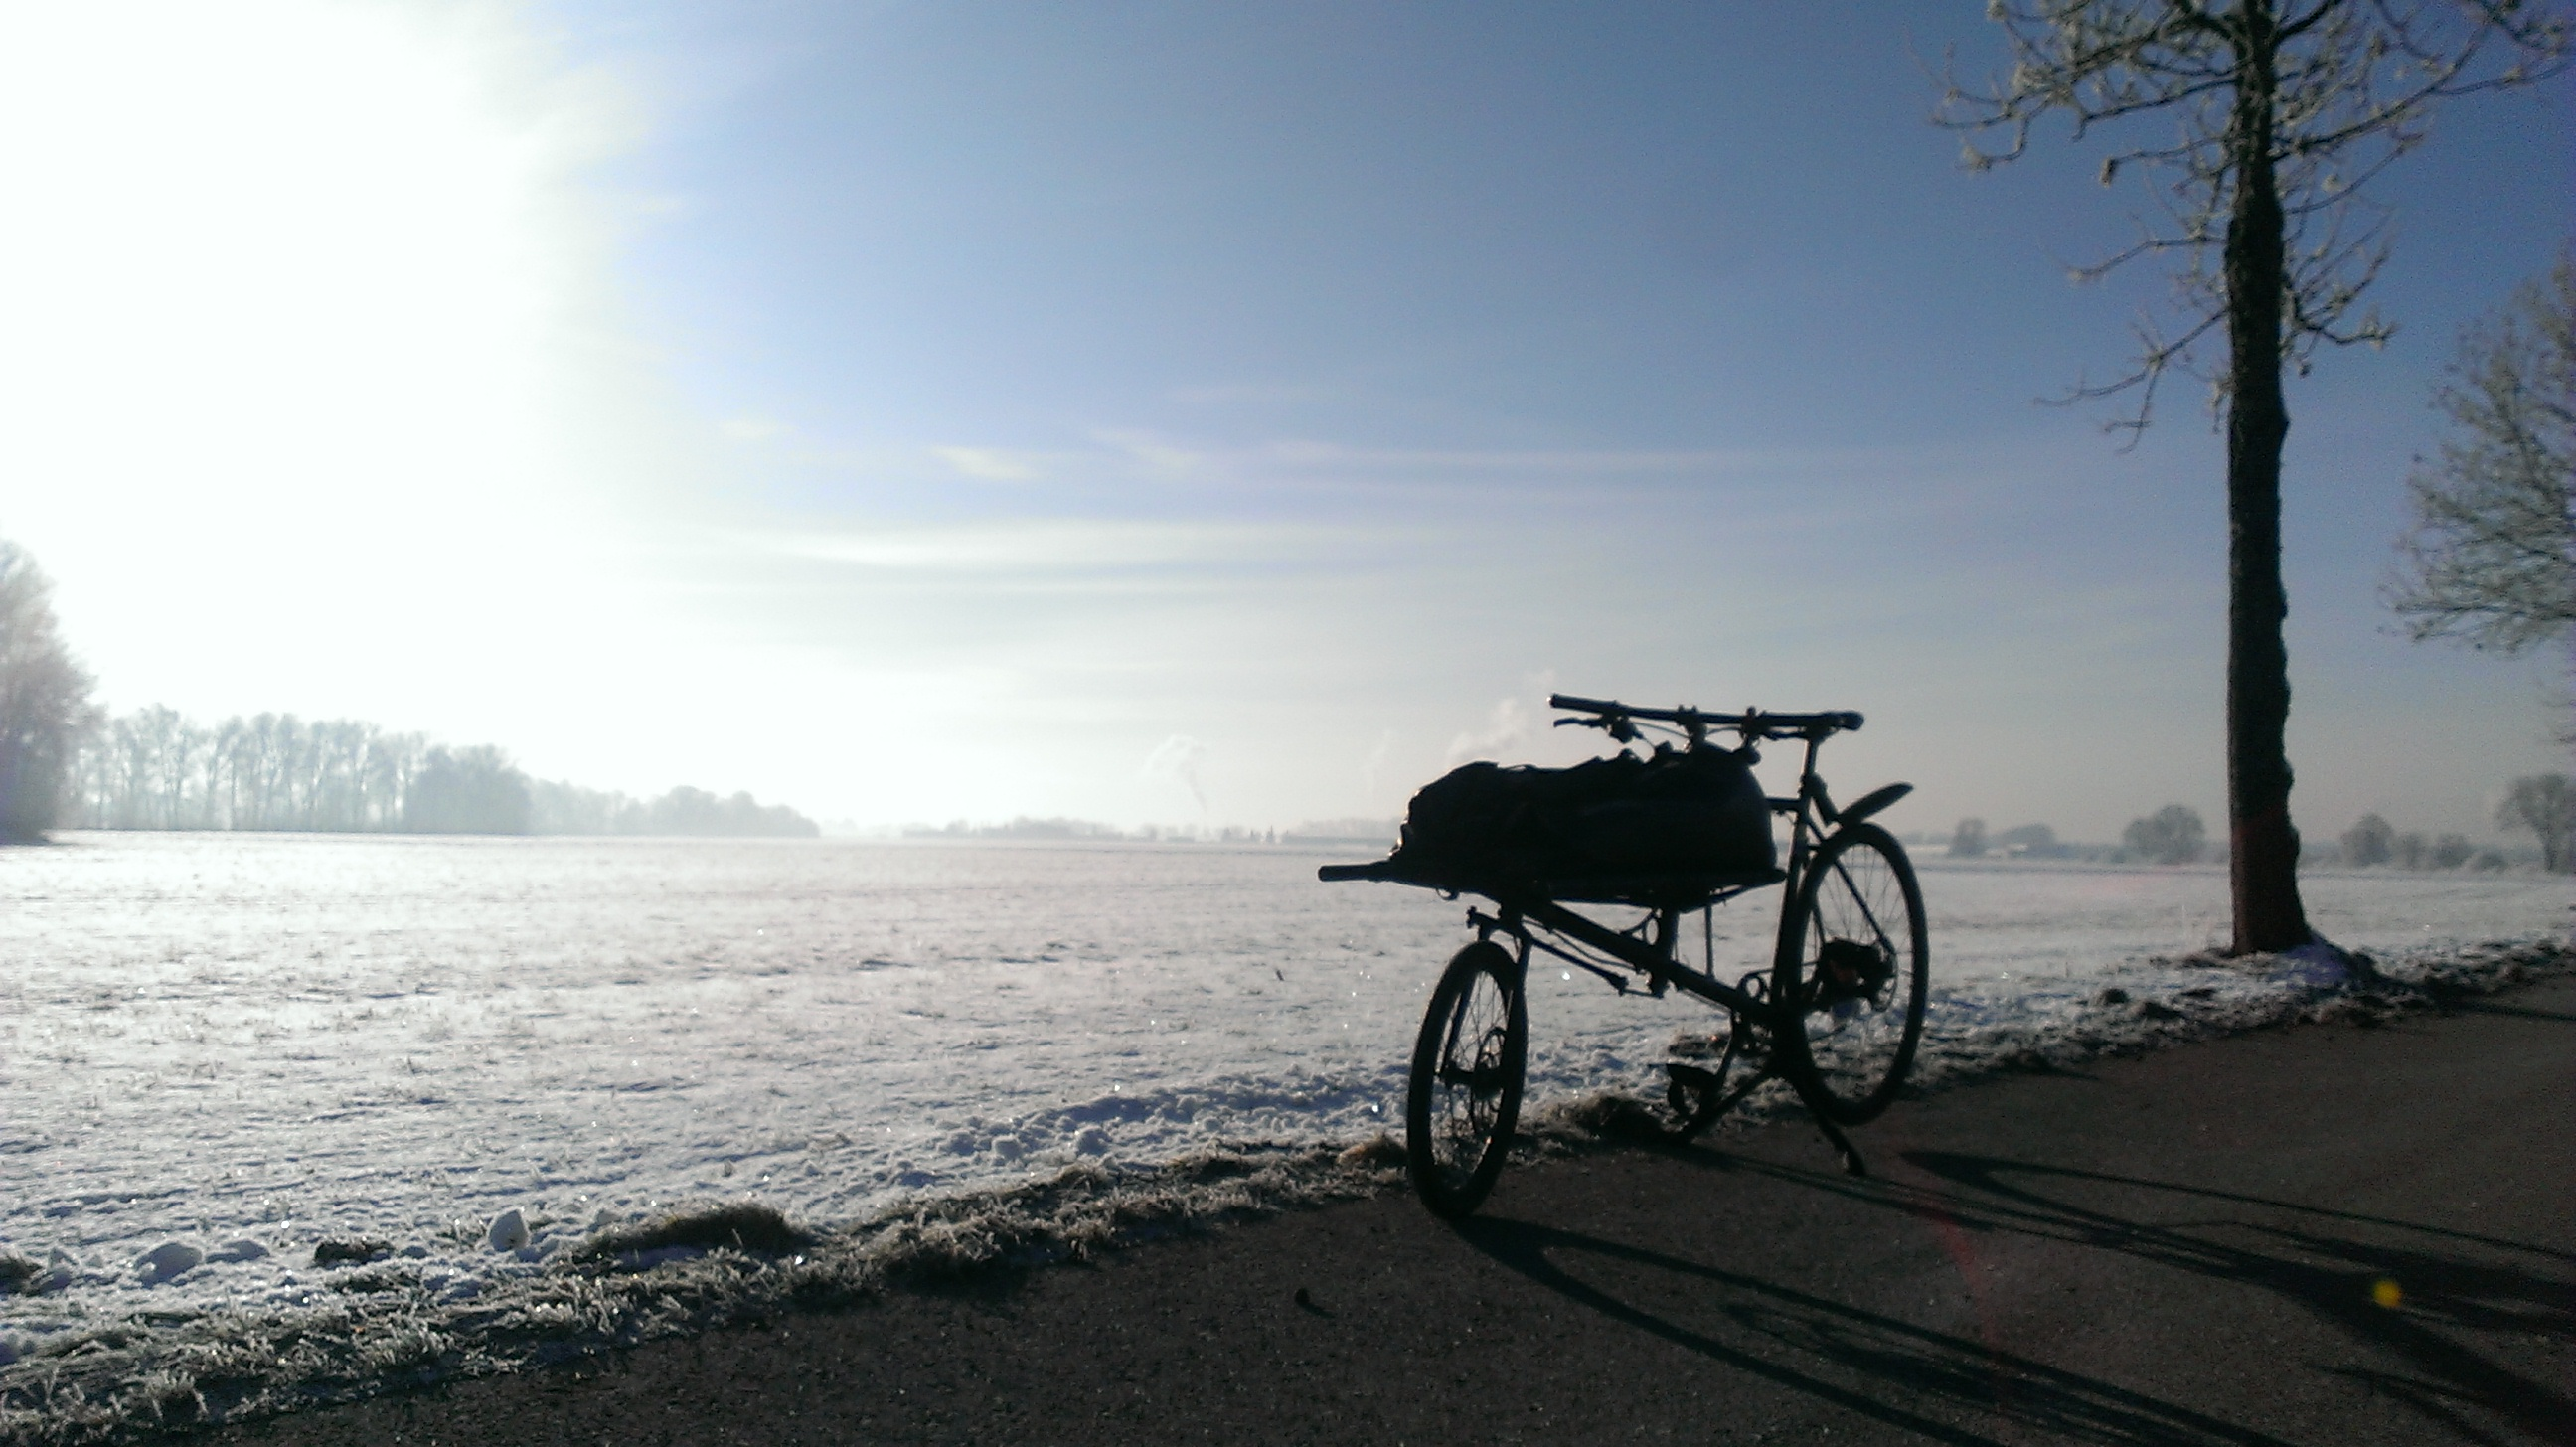 bakfiets-family - omnium-cargobike in winterlandscape